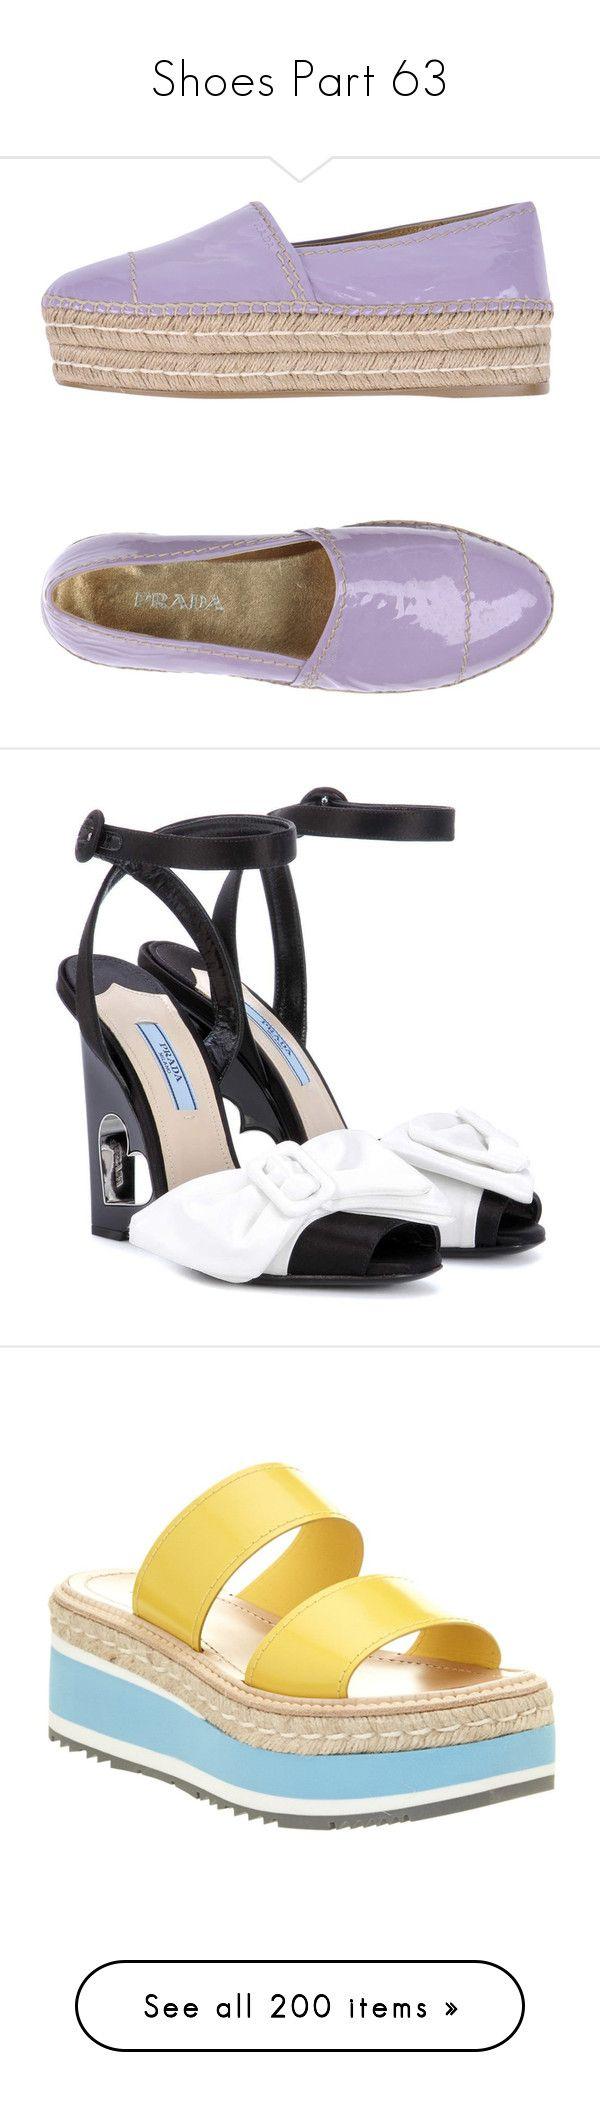 """Shoes Part 63"" by leanne-mcclean ❤ liked on Polyvore featuring shoes, sandals, light purple, flatform shoes, flatform espadrilles, round cap, leather shoes, leather espadrille sandals, black and prada footwear"